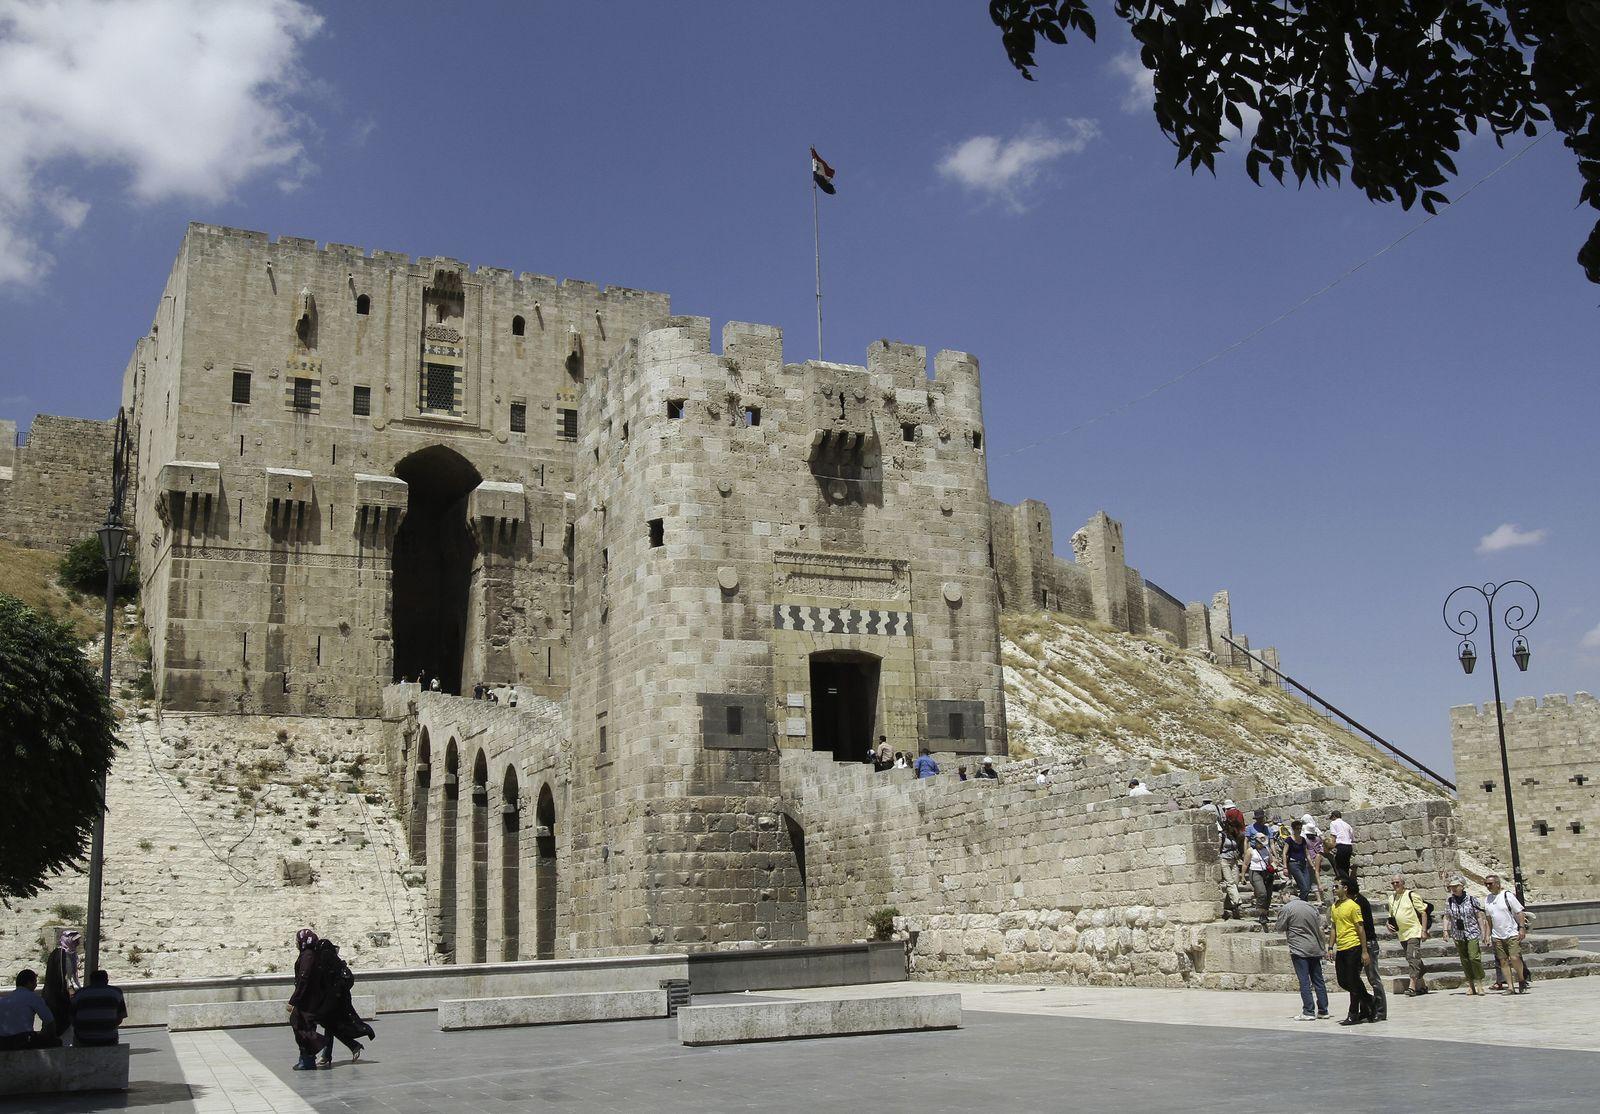 Aleppo/ Syrien/ Zitadelle